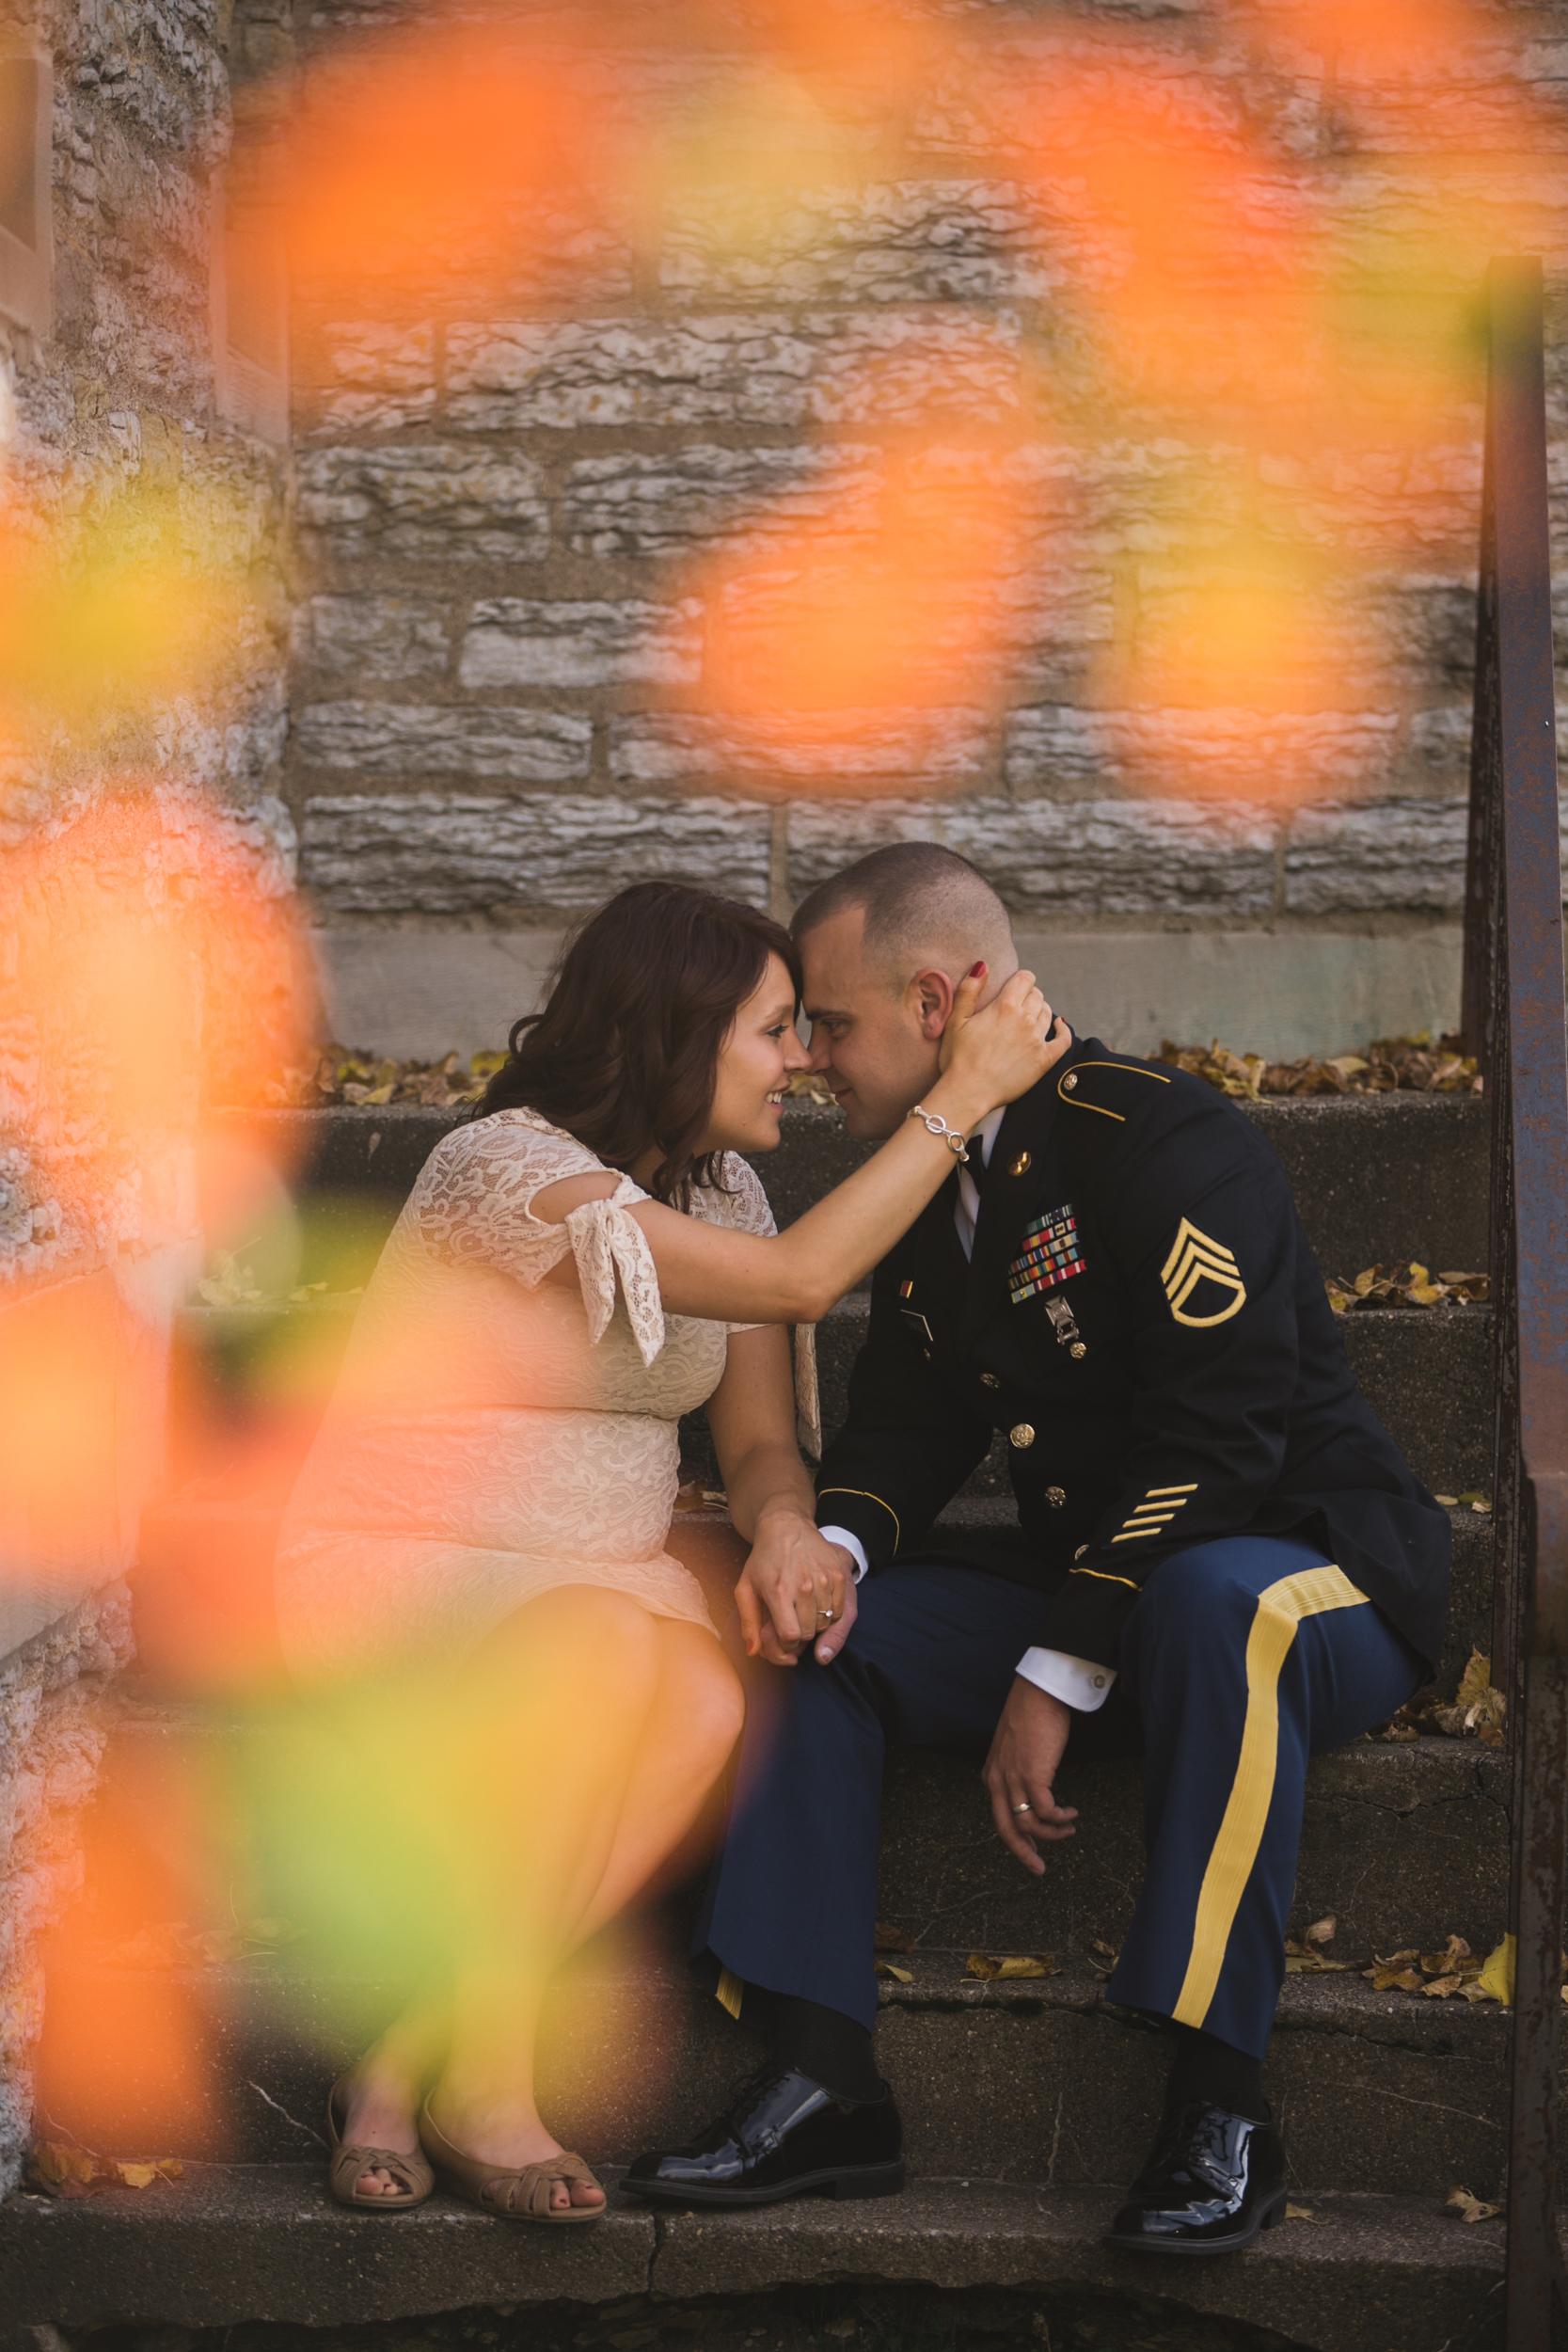 Fort Snelling Elopement St. Paul, MN, Fort Snelling Elopement, Military Elopement, Intimate Military Wedding, intimate elopement wedding-www.rachelsmak.com13.jpg